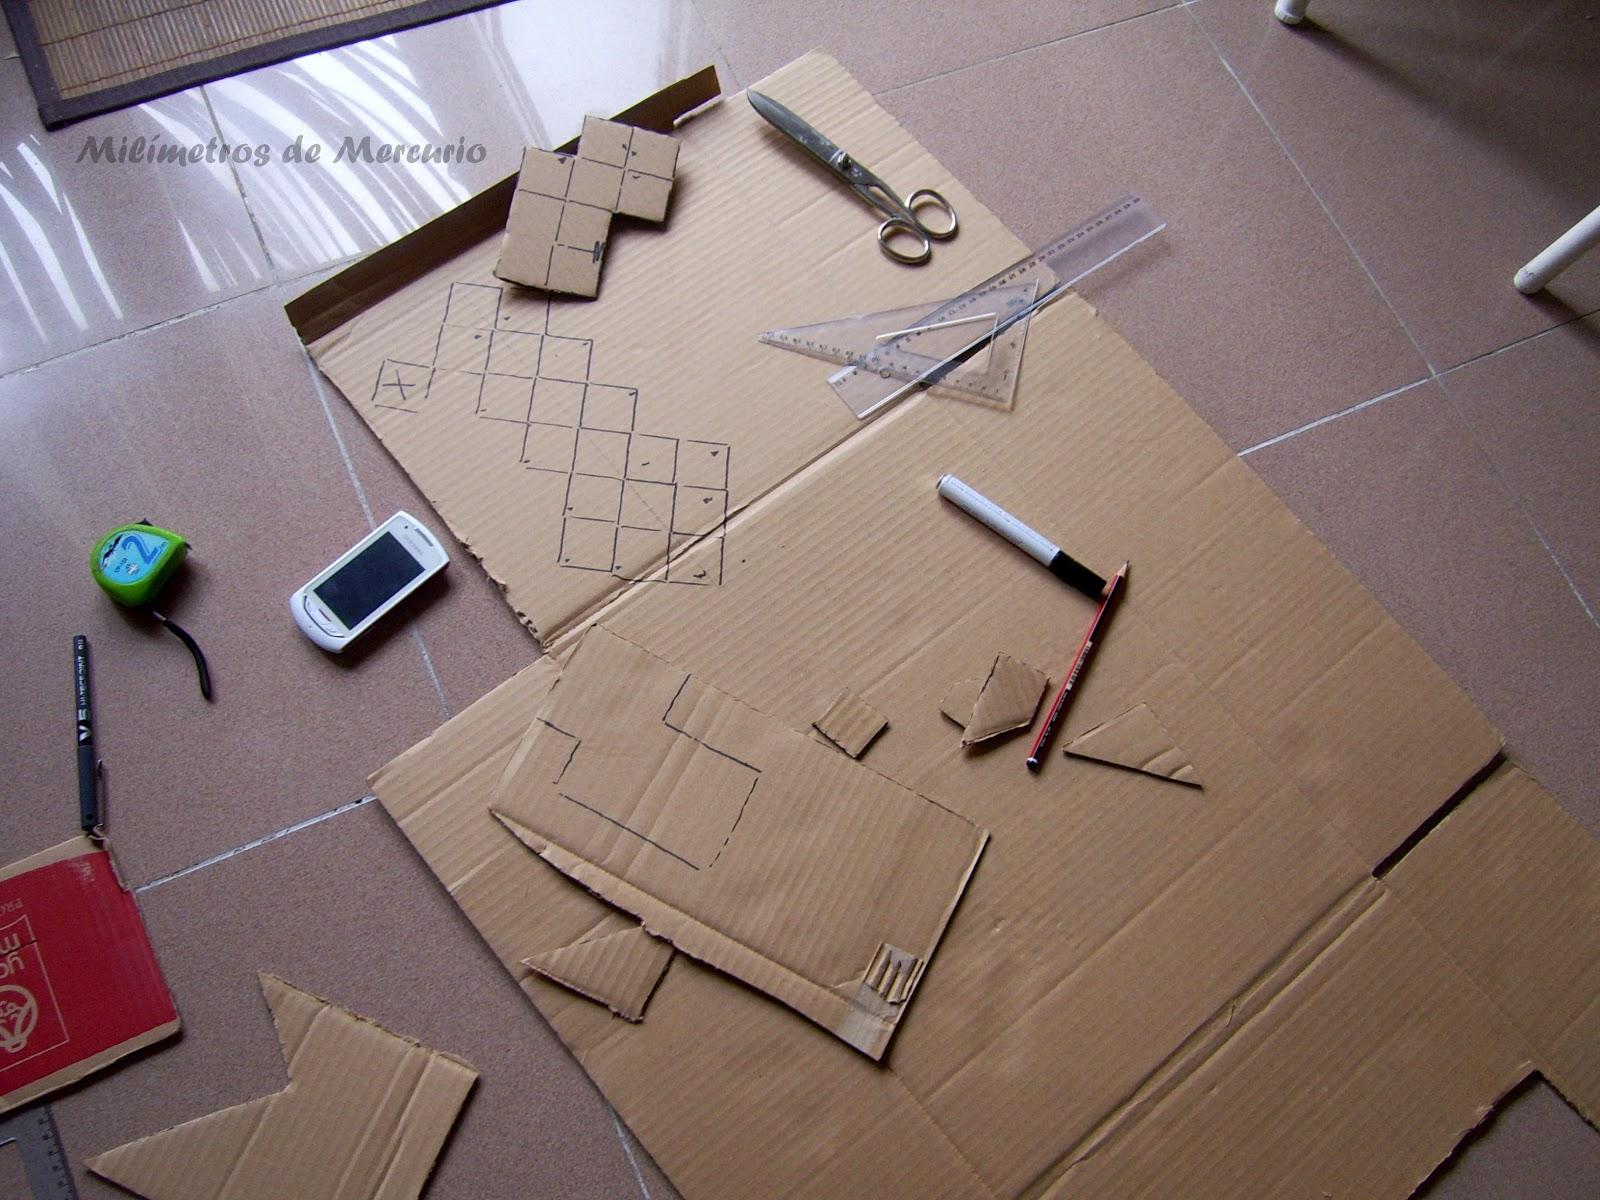 mil metros de mercurio creeper revenge espada minecraft. Black Bedroom Furniture Sets. Home Design Ideas